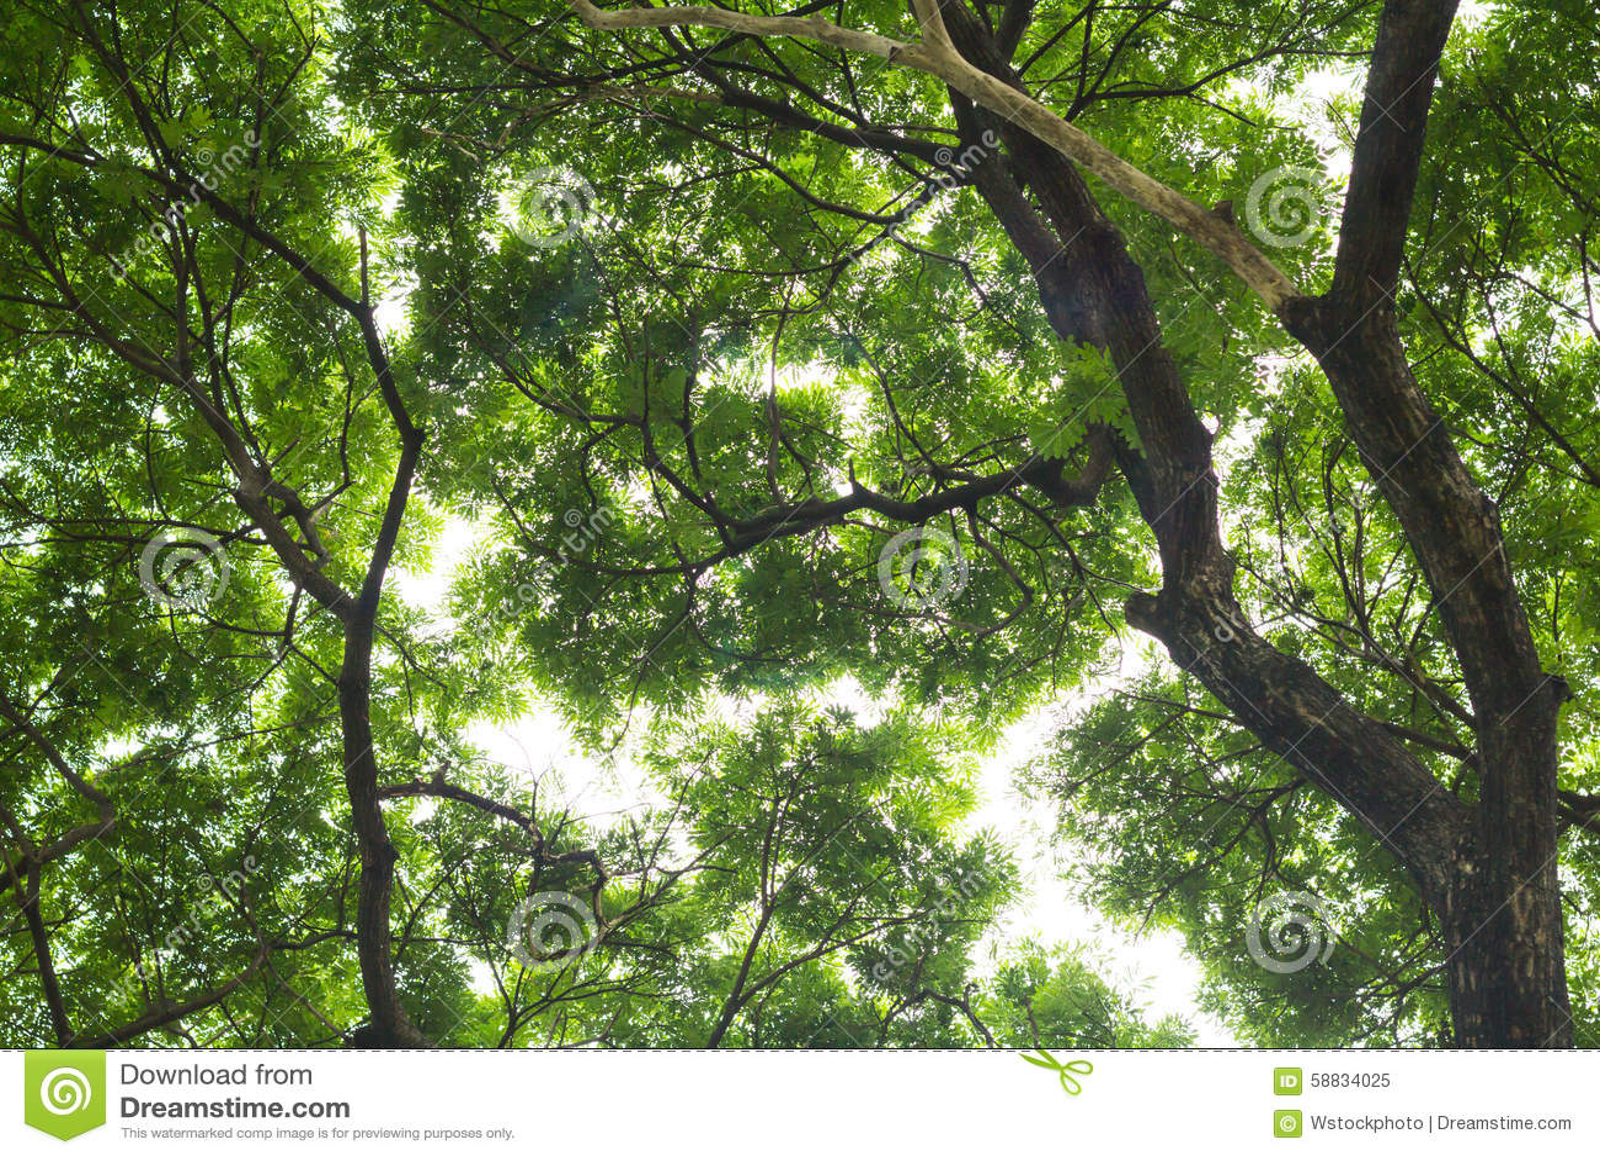 Onder mening van grote boom toon detail groene bladeren voor backgroun